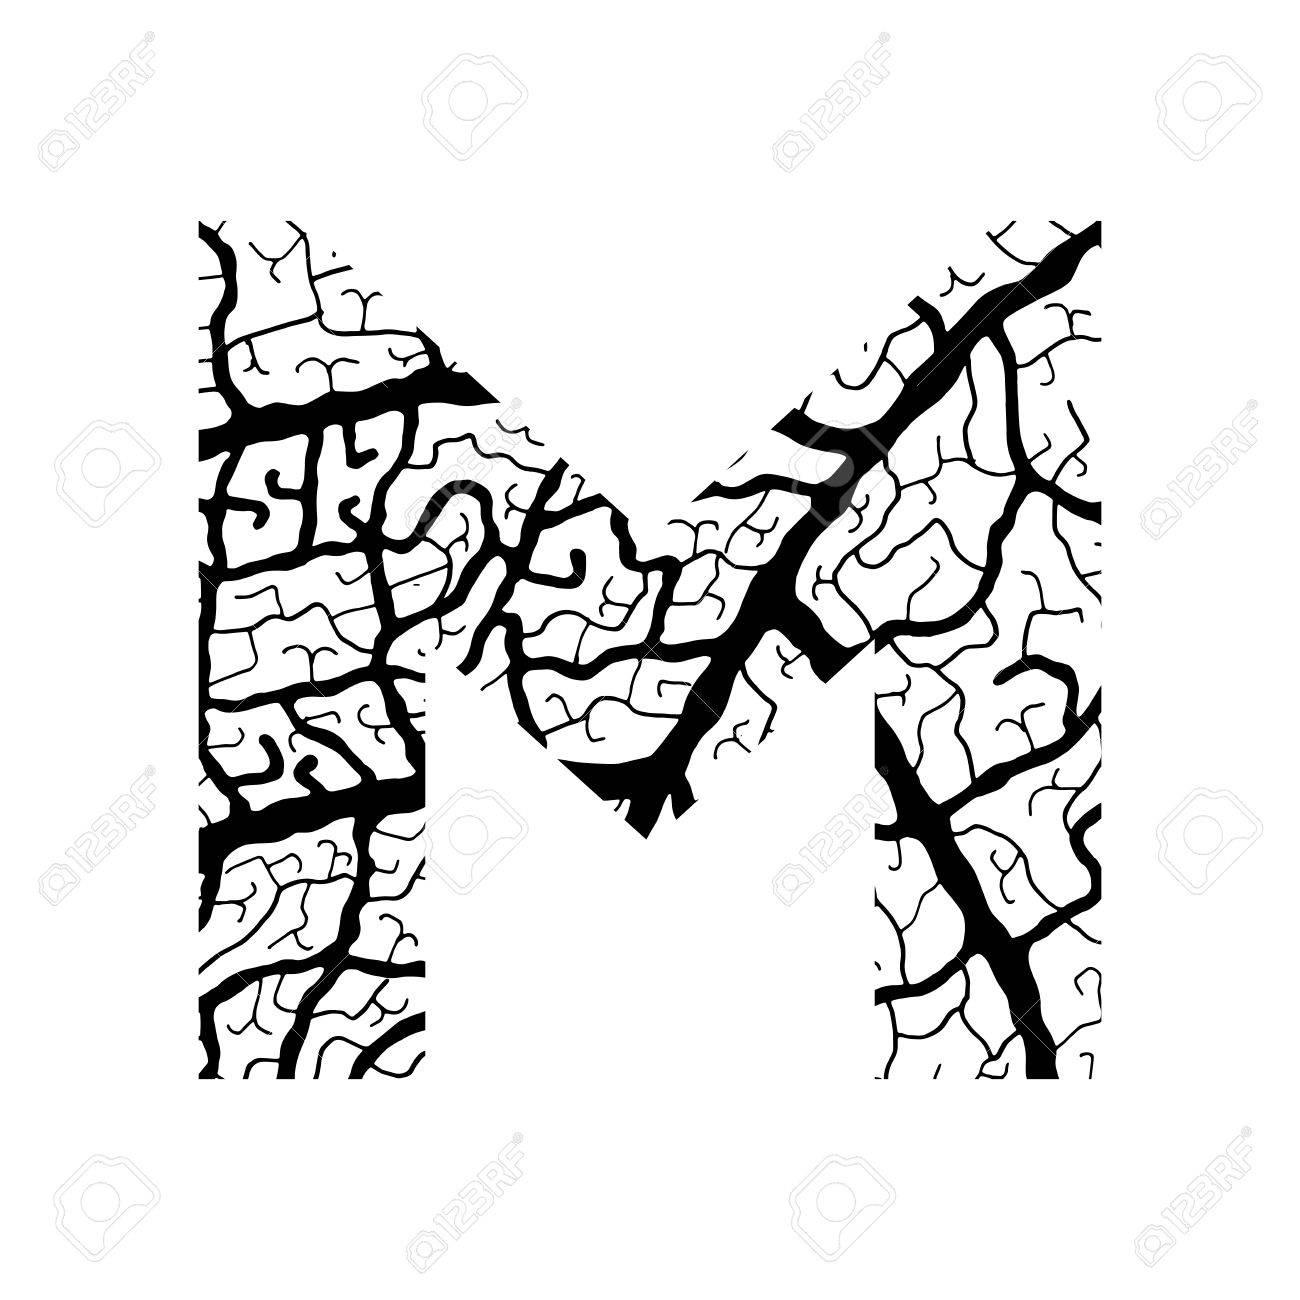 Nature Alphabet Ecology Decorative Font Capital Letter M Filled With Leaf Veins Pattern Black